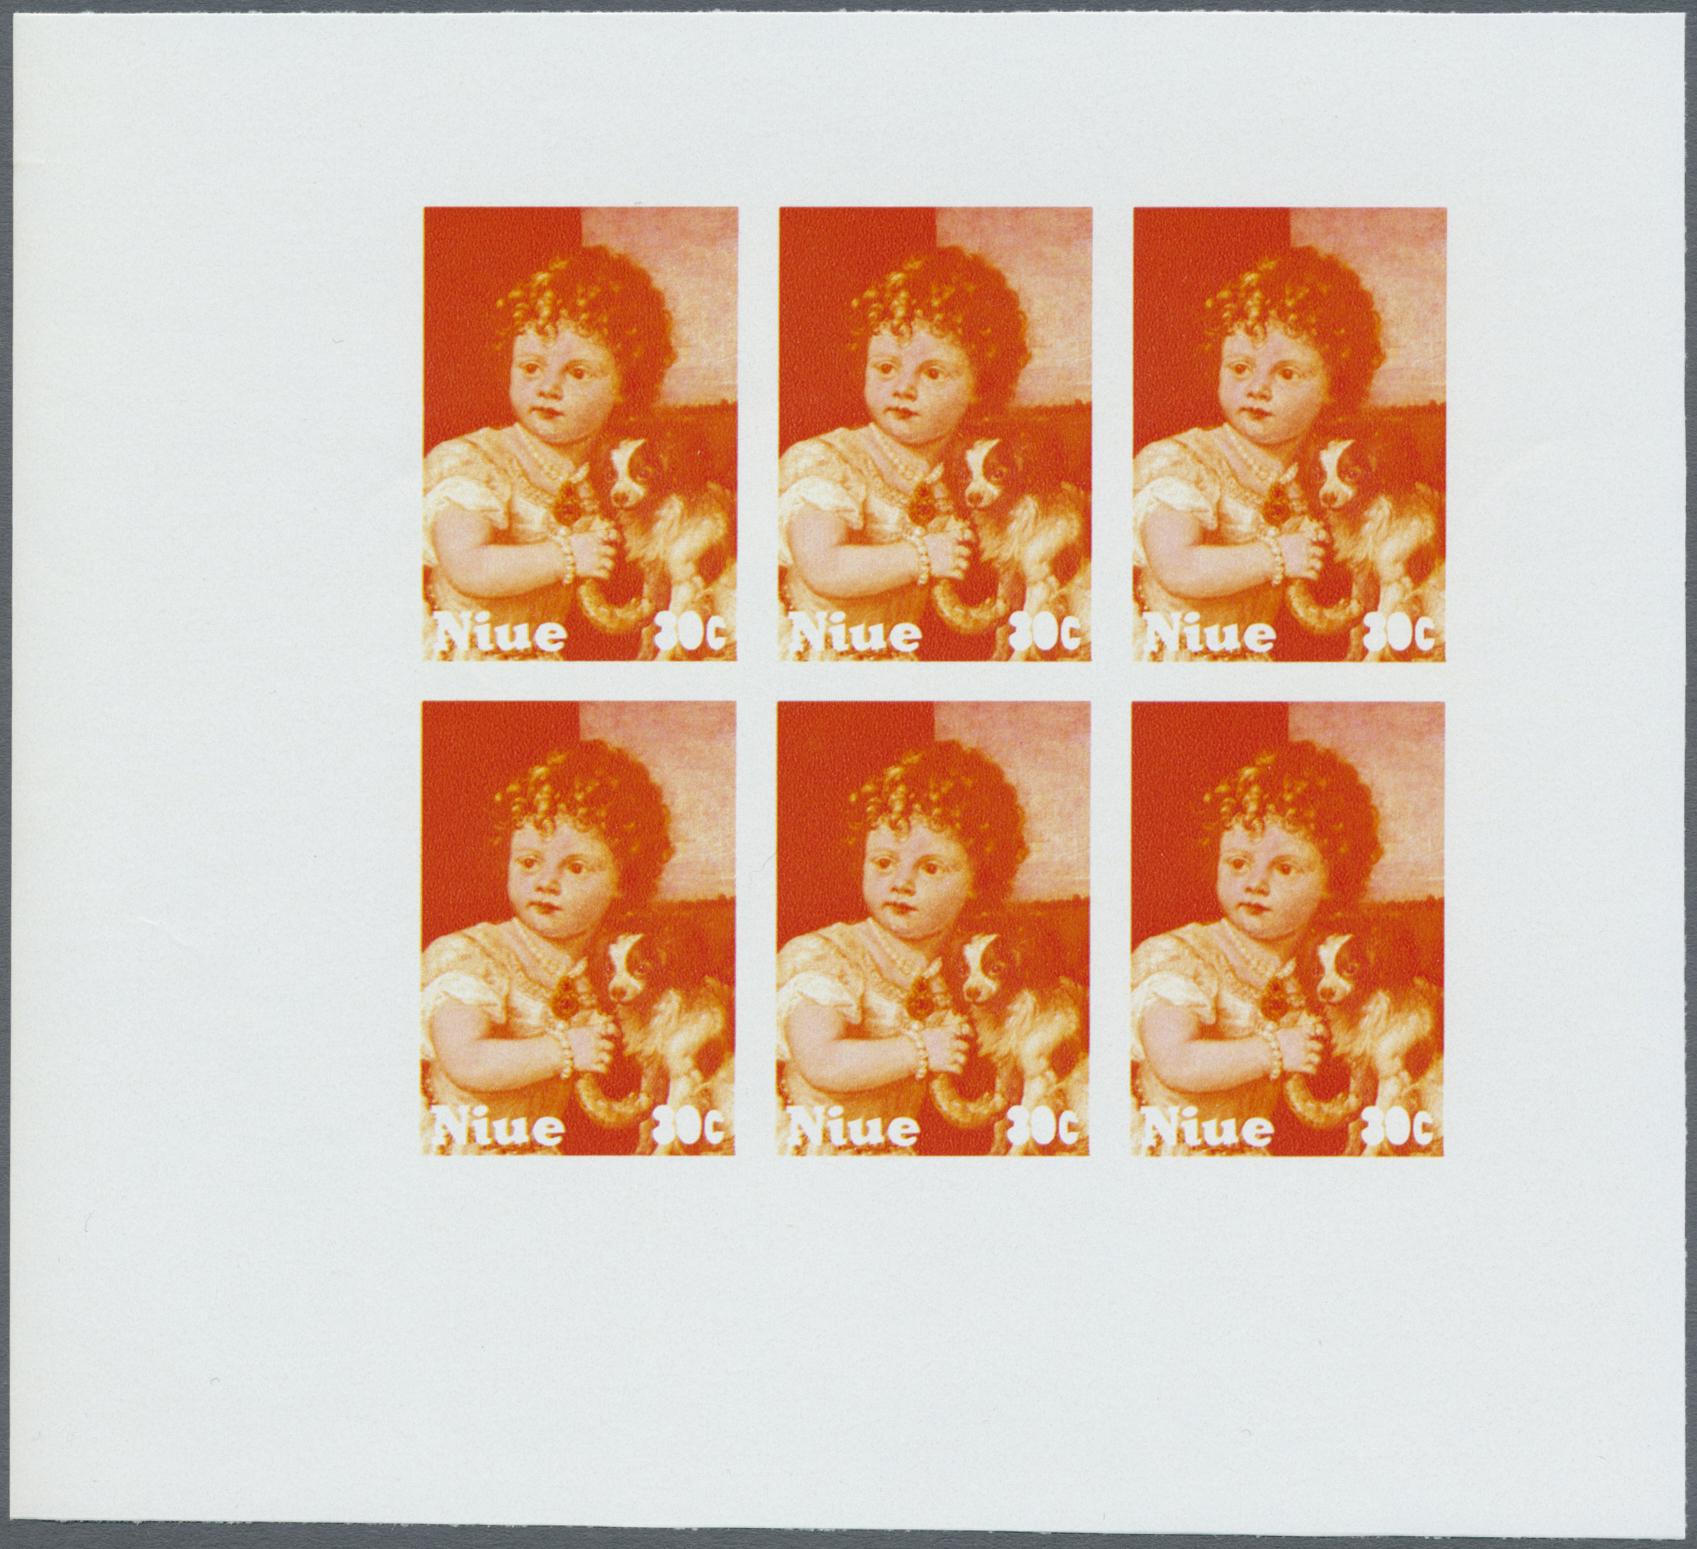 Lot 11343 - thematik: kinder / children  -  Auktionshaus Christoph Gärtner GmbH & Co. KG Single lots Philately Overseas & Europe. Auction #39 Day 4